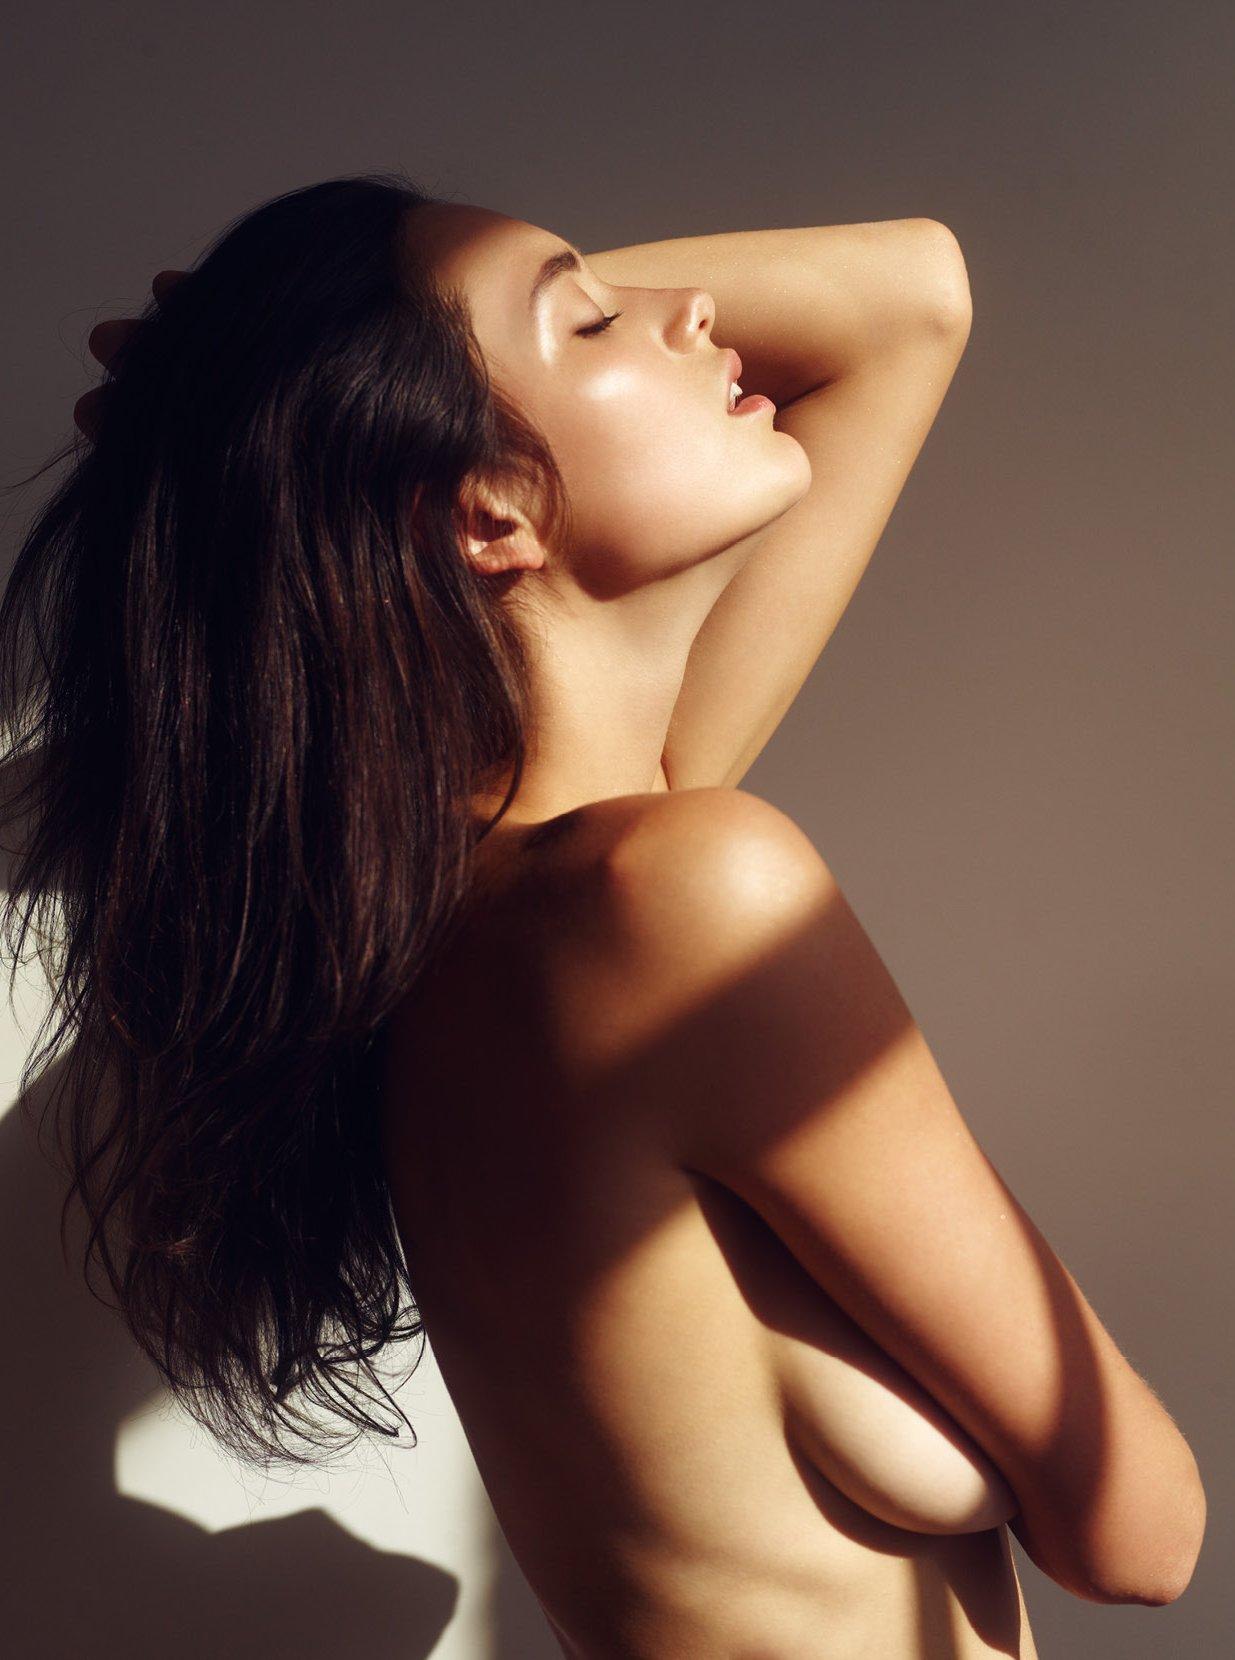 brune topless